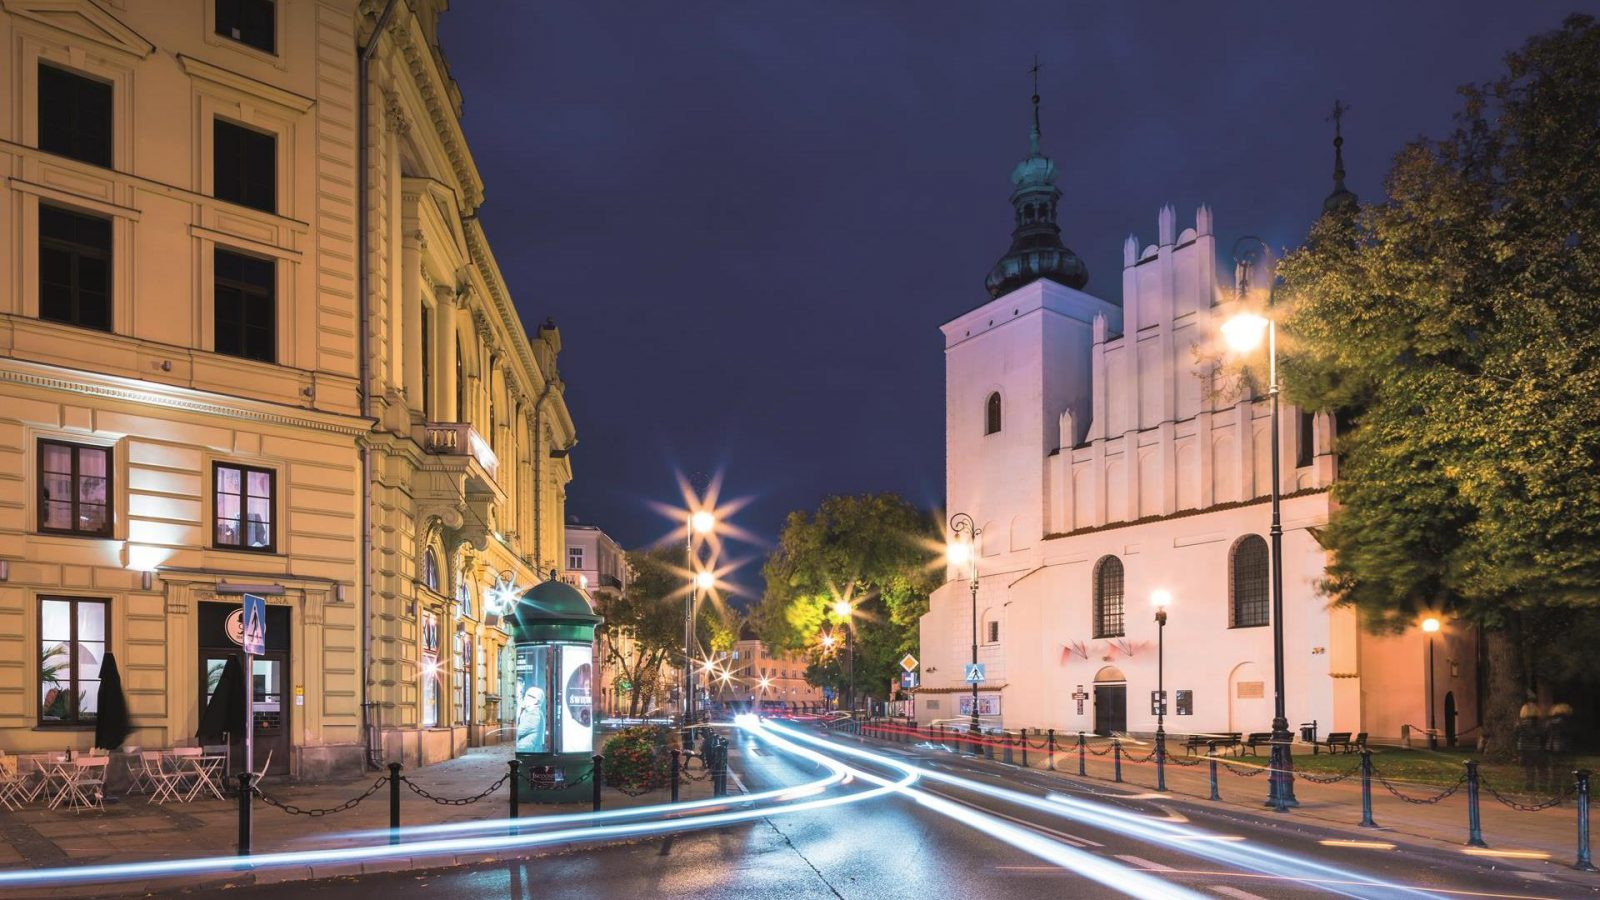 36_37_Album-Szlaki-Lublina-MarcinTarkowski-pl-179